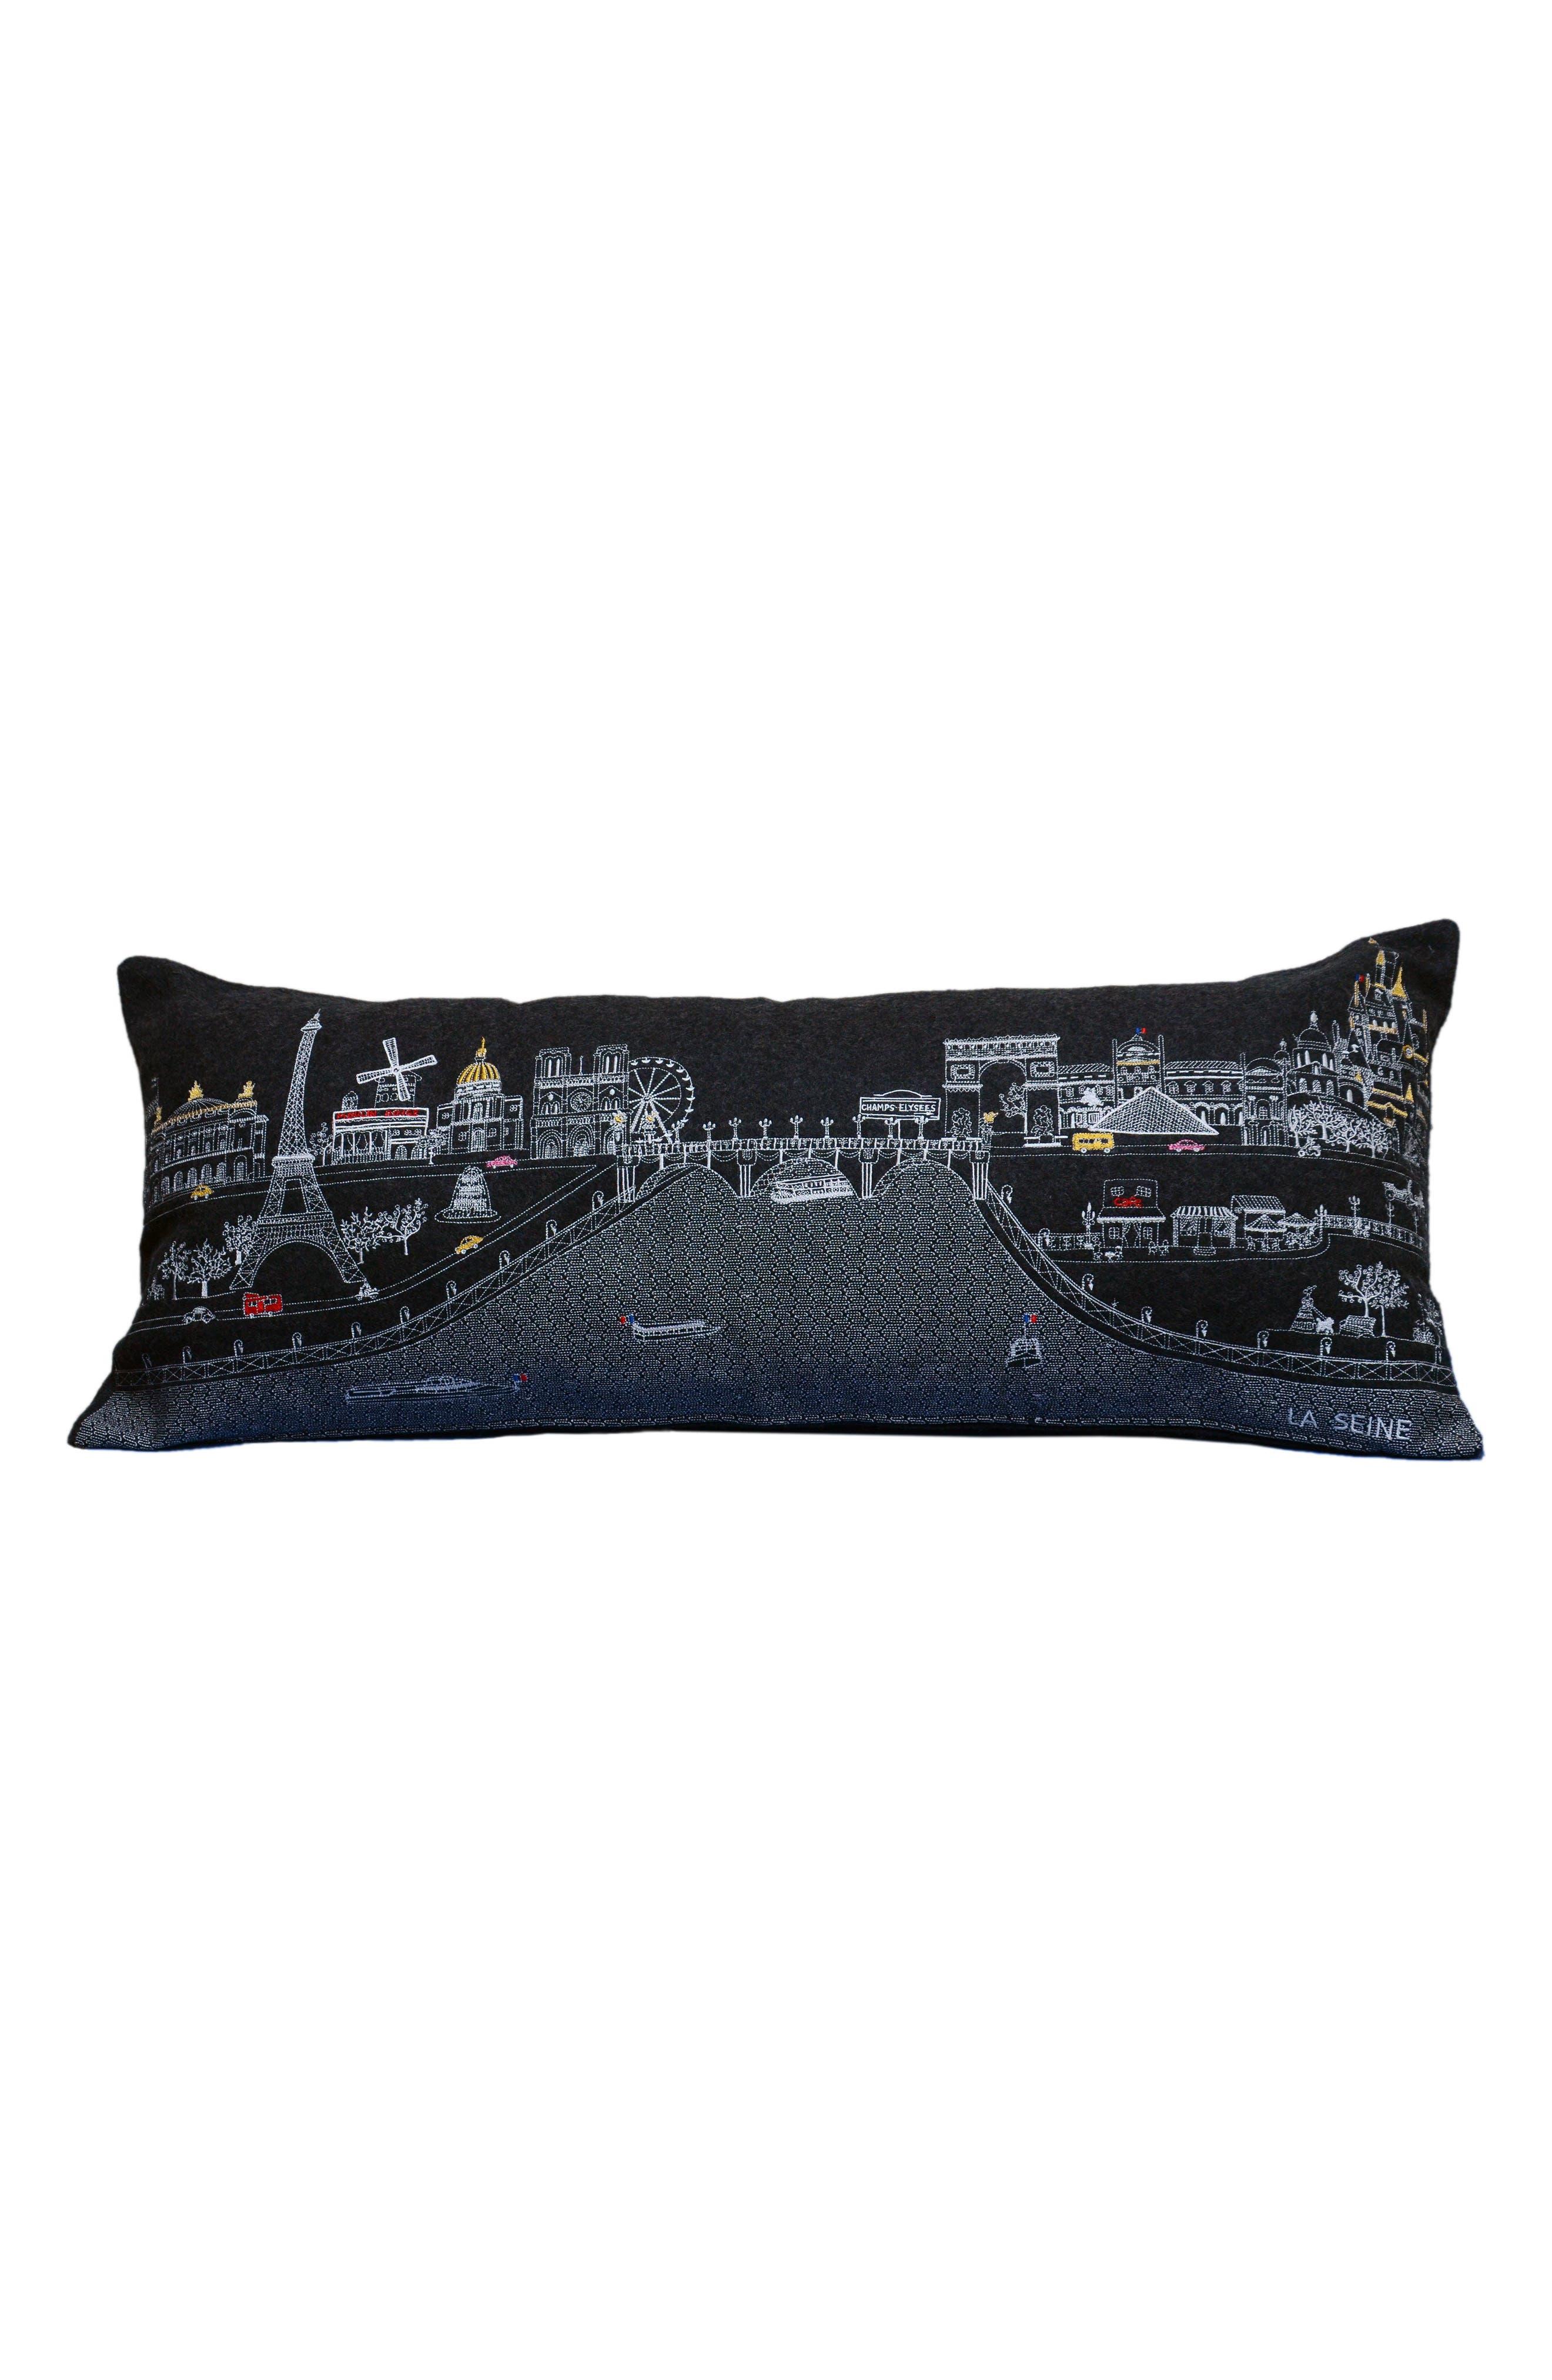 Paris Embroidered Skyline Pillow,                             Main thumbnail 1, color,                             BLACK